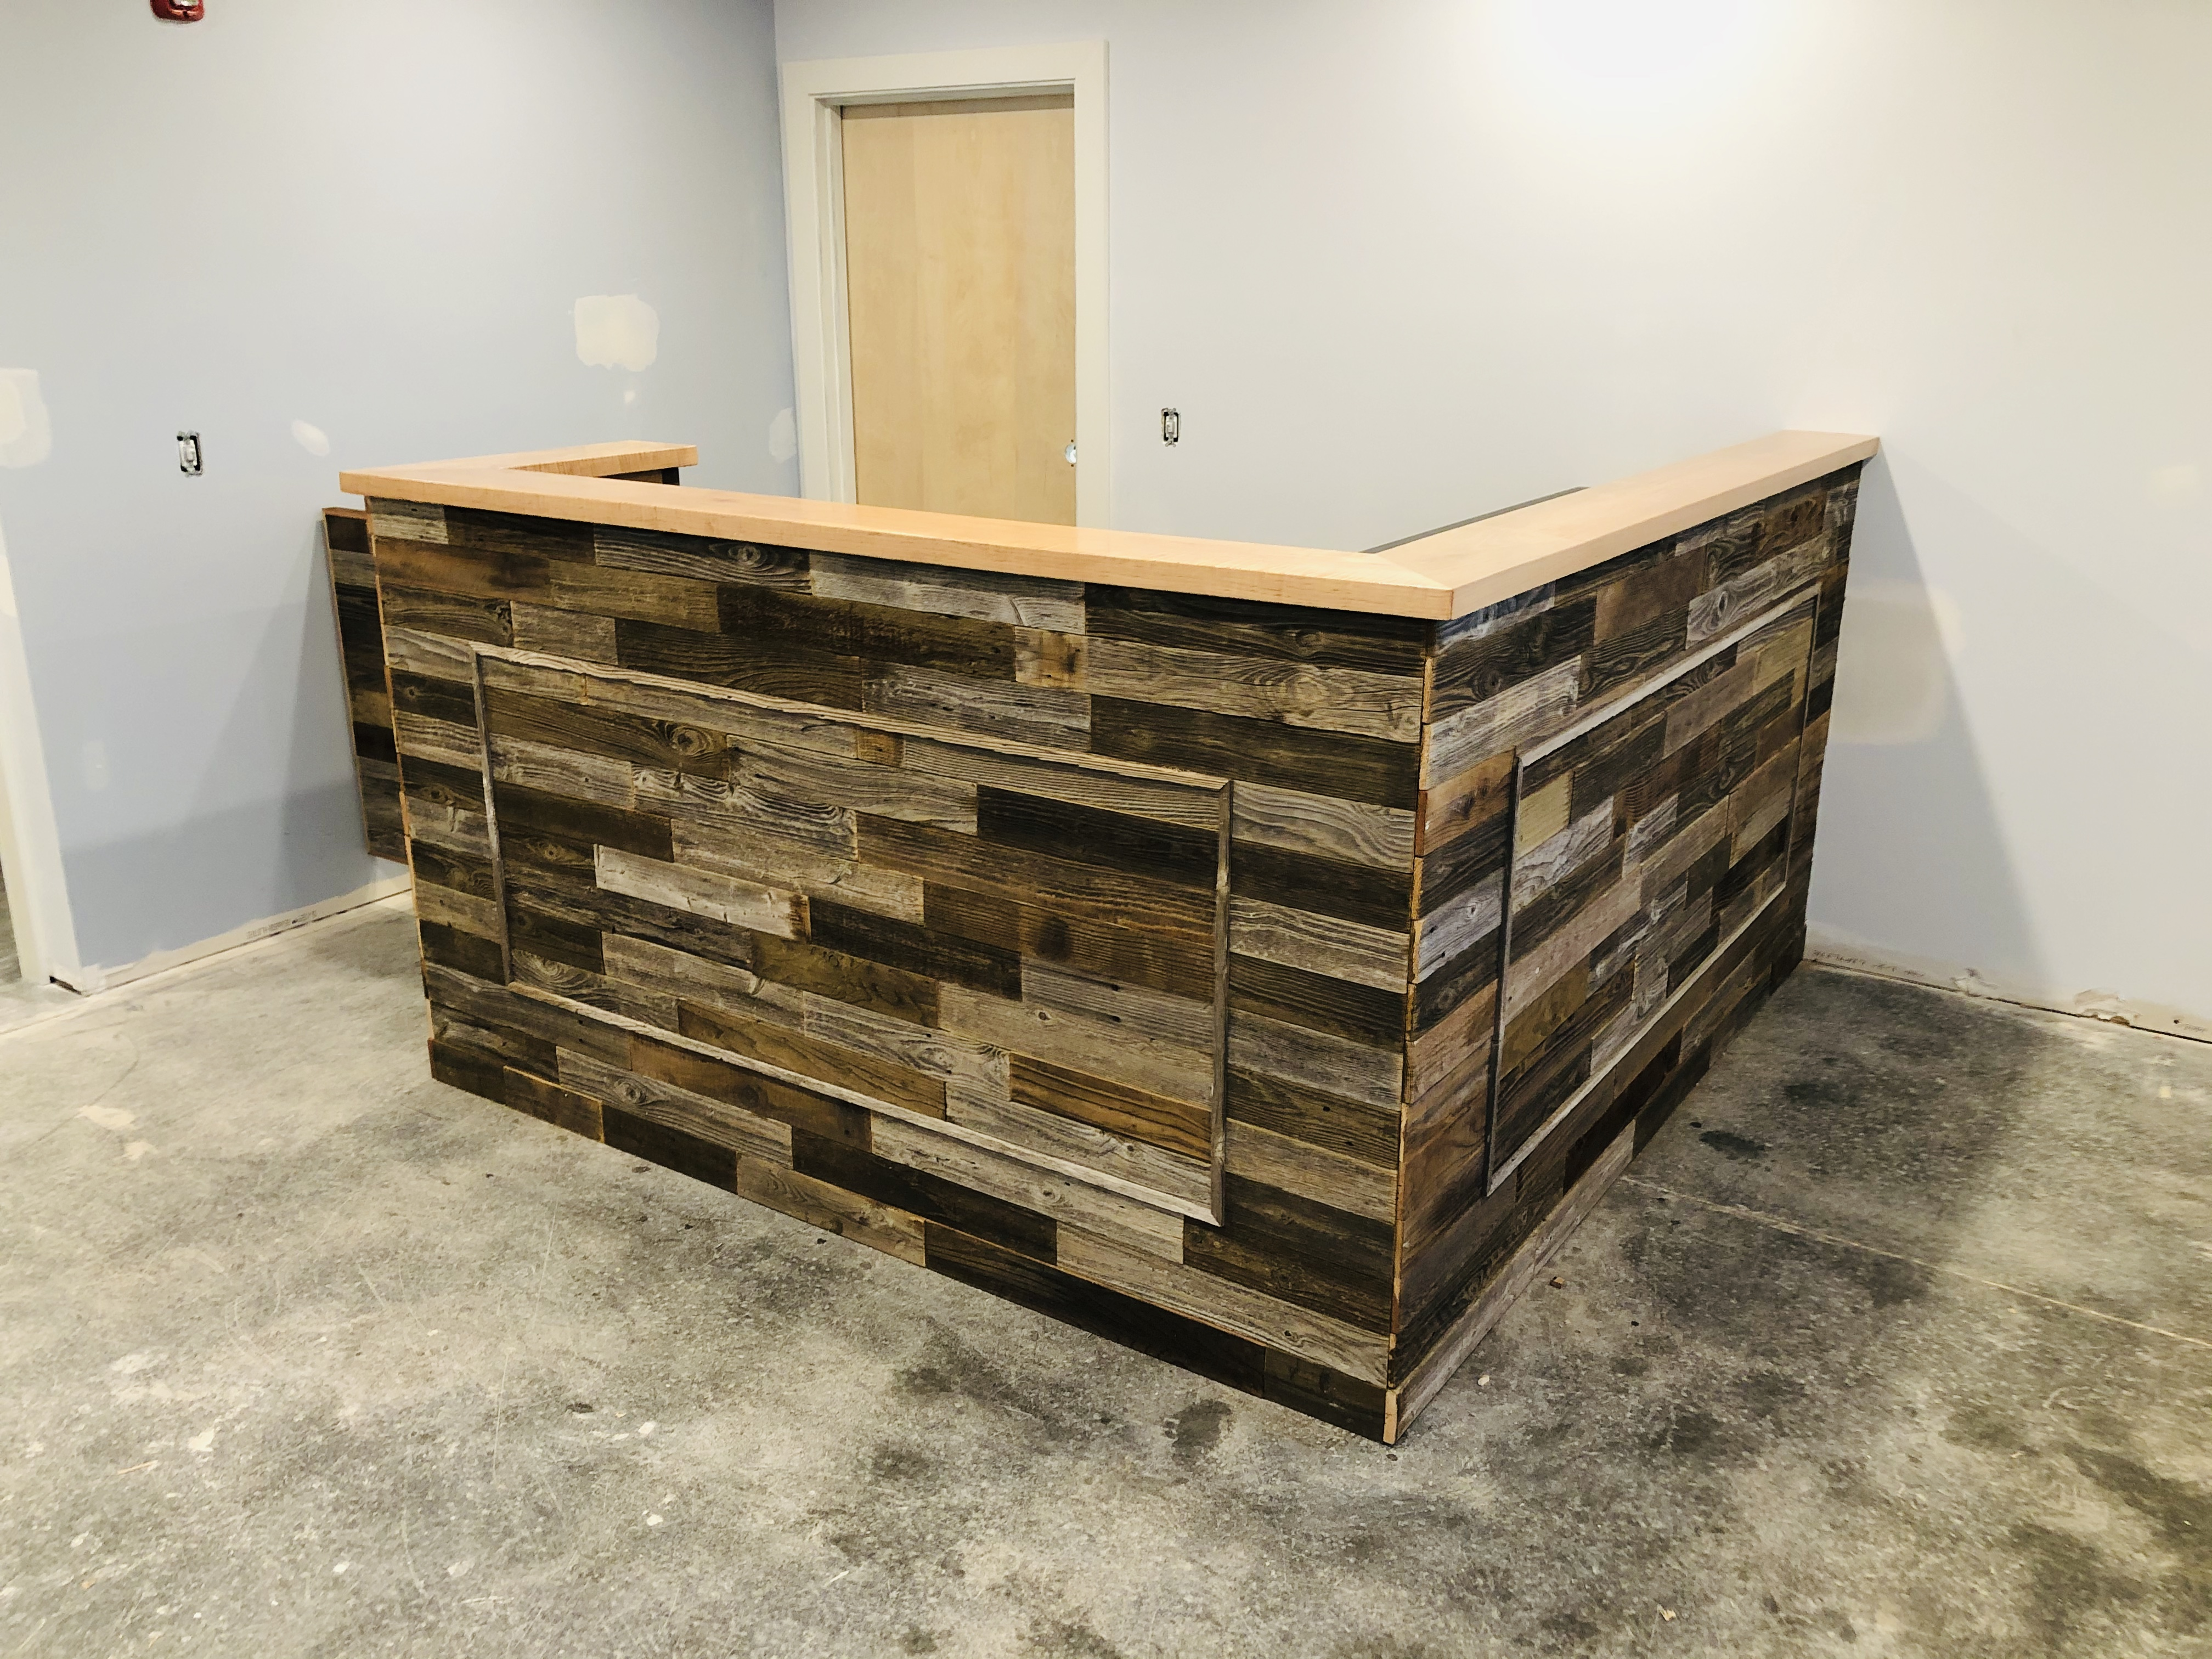 Pallet wood reception area